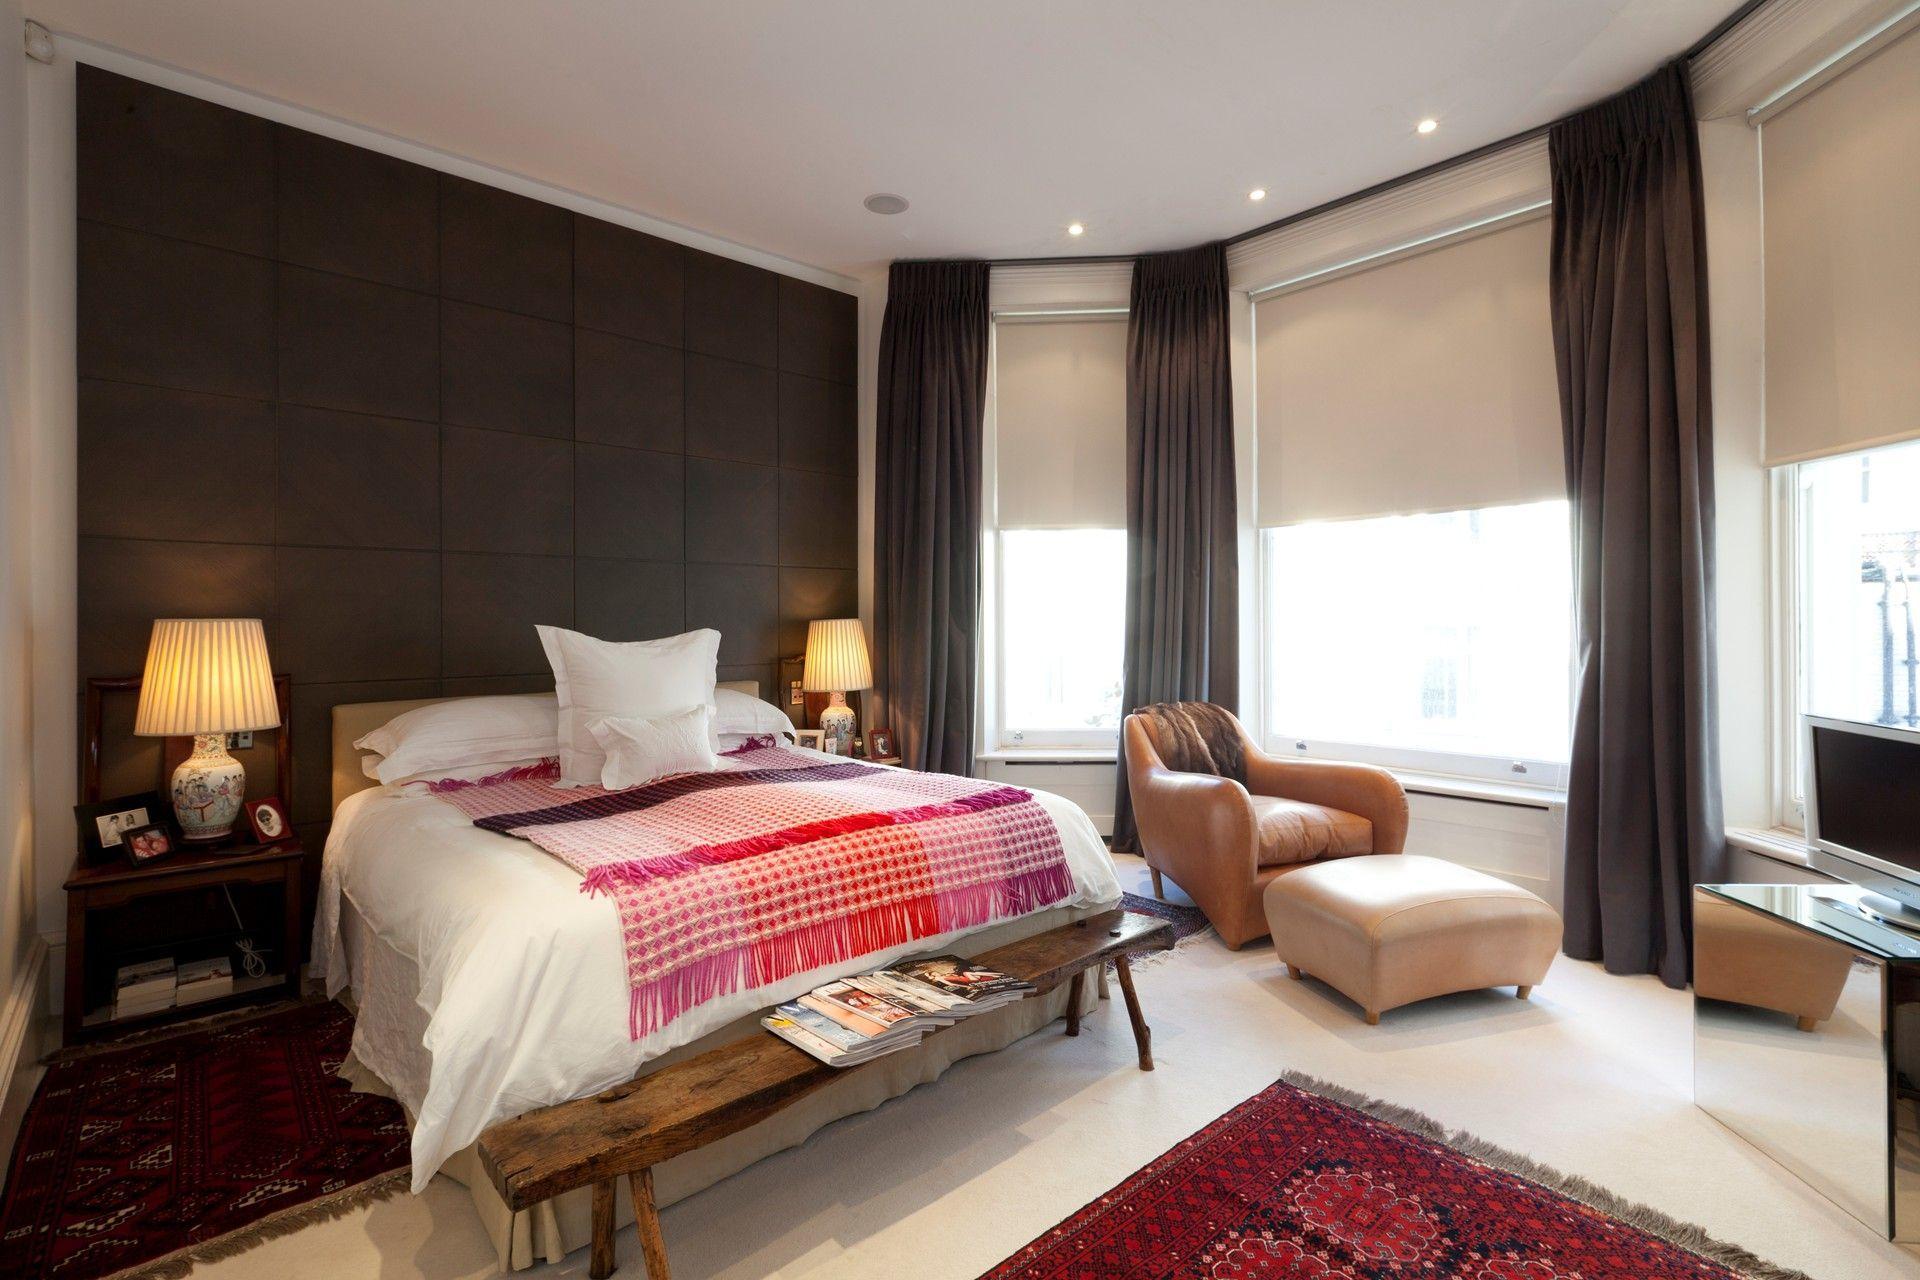 8262483acd9cea2ac7c0c97a1067d931 - Notting Hill Gate Hotel Clanricarde Gardens